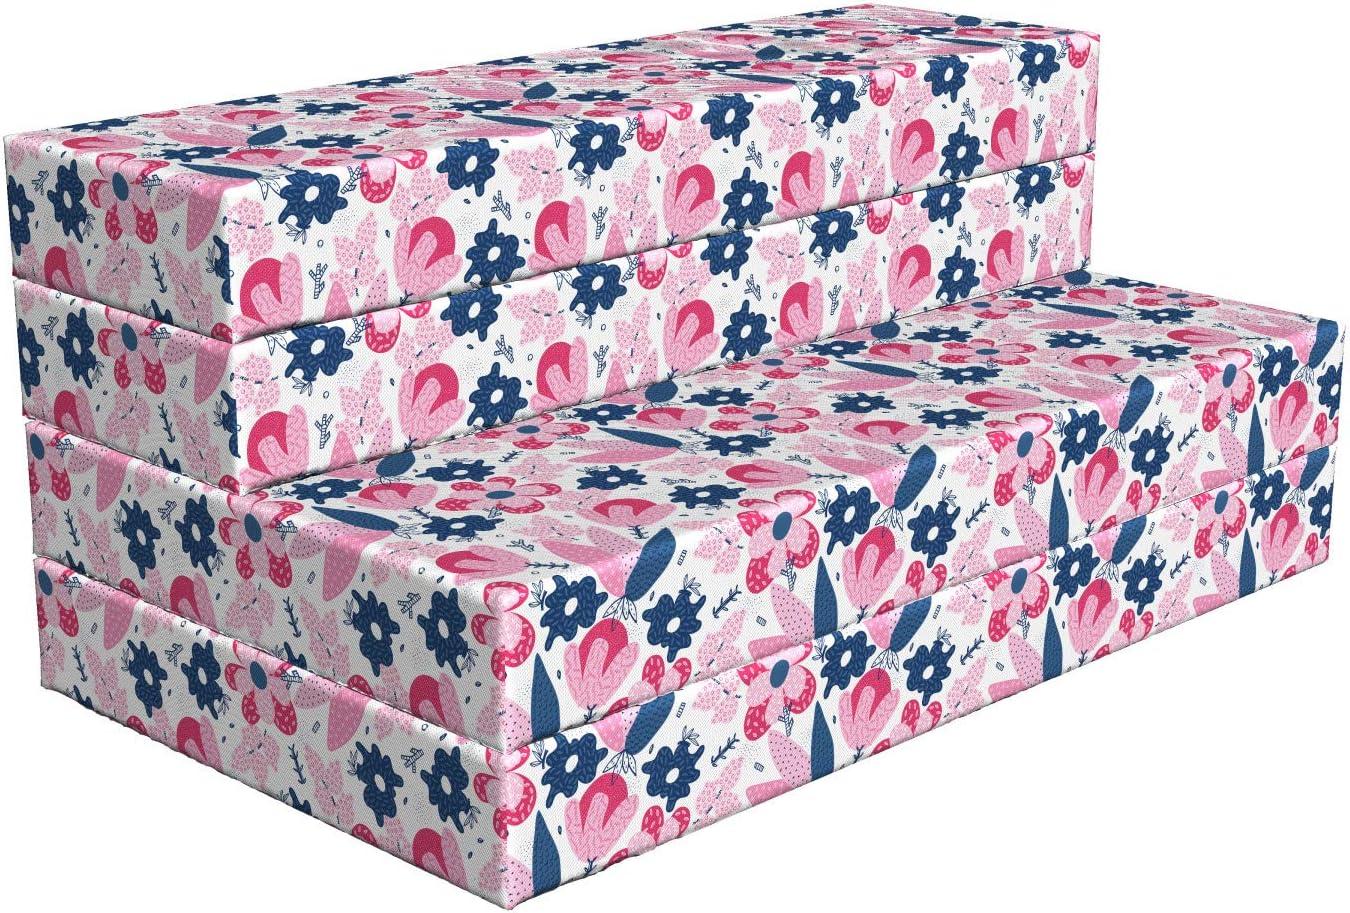 Lunarable Floral Foldable Mattress Colorful Summer Plant Spring 100% Nashville-Davidson Mall quality warranty